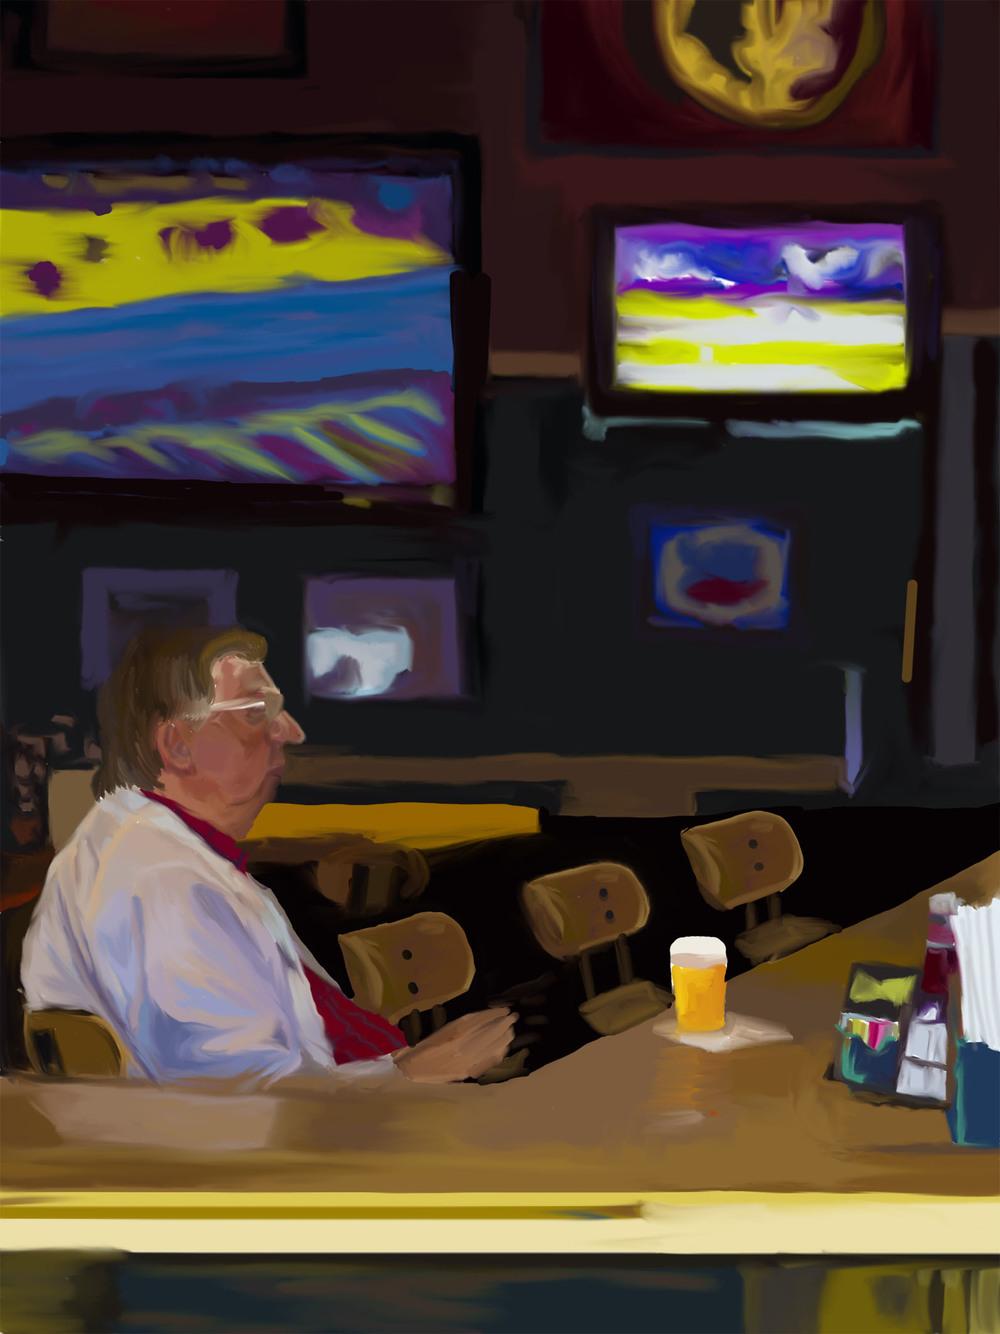 Alone at a Bar